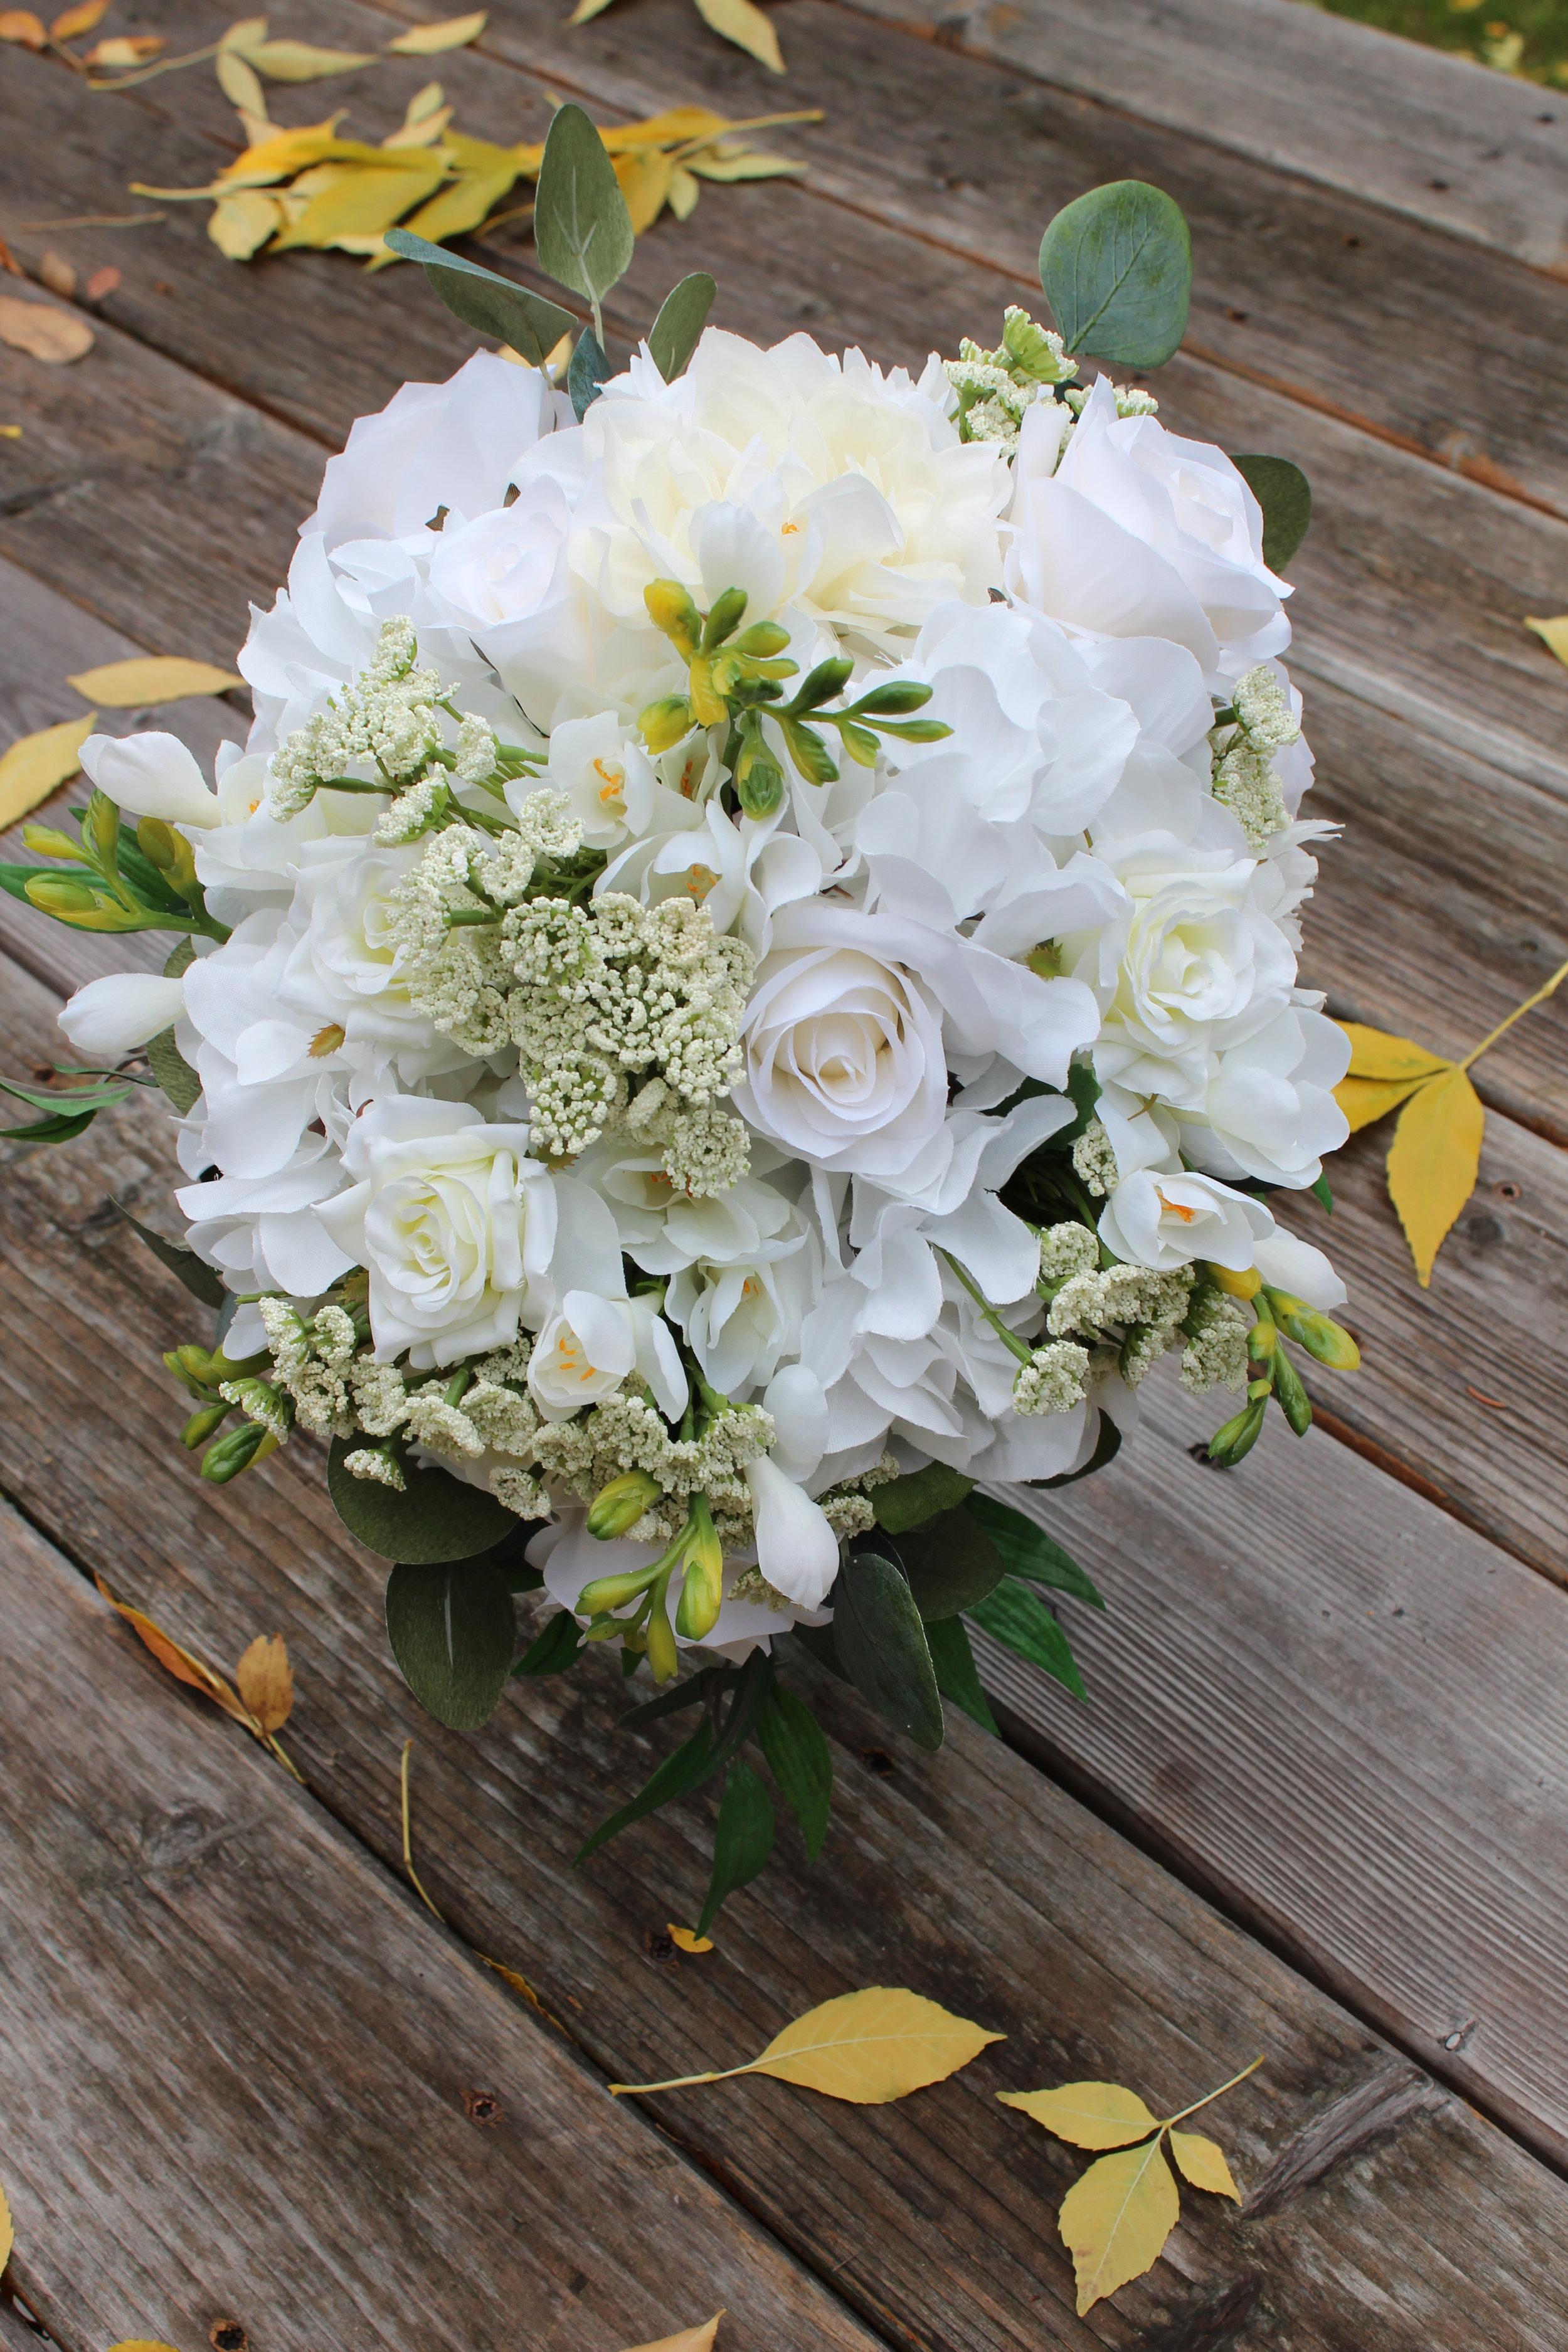 Roses, Freesia, Hydrangea, Dahlia, Queen Anne's Lace, Eucalyptus, Smilax